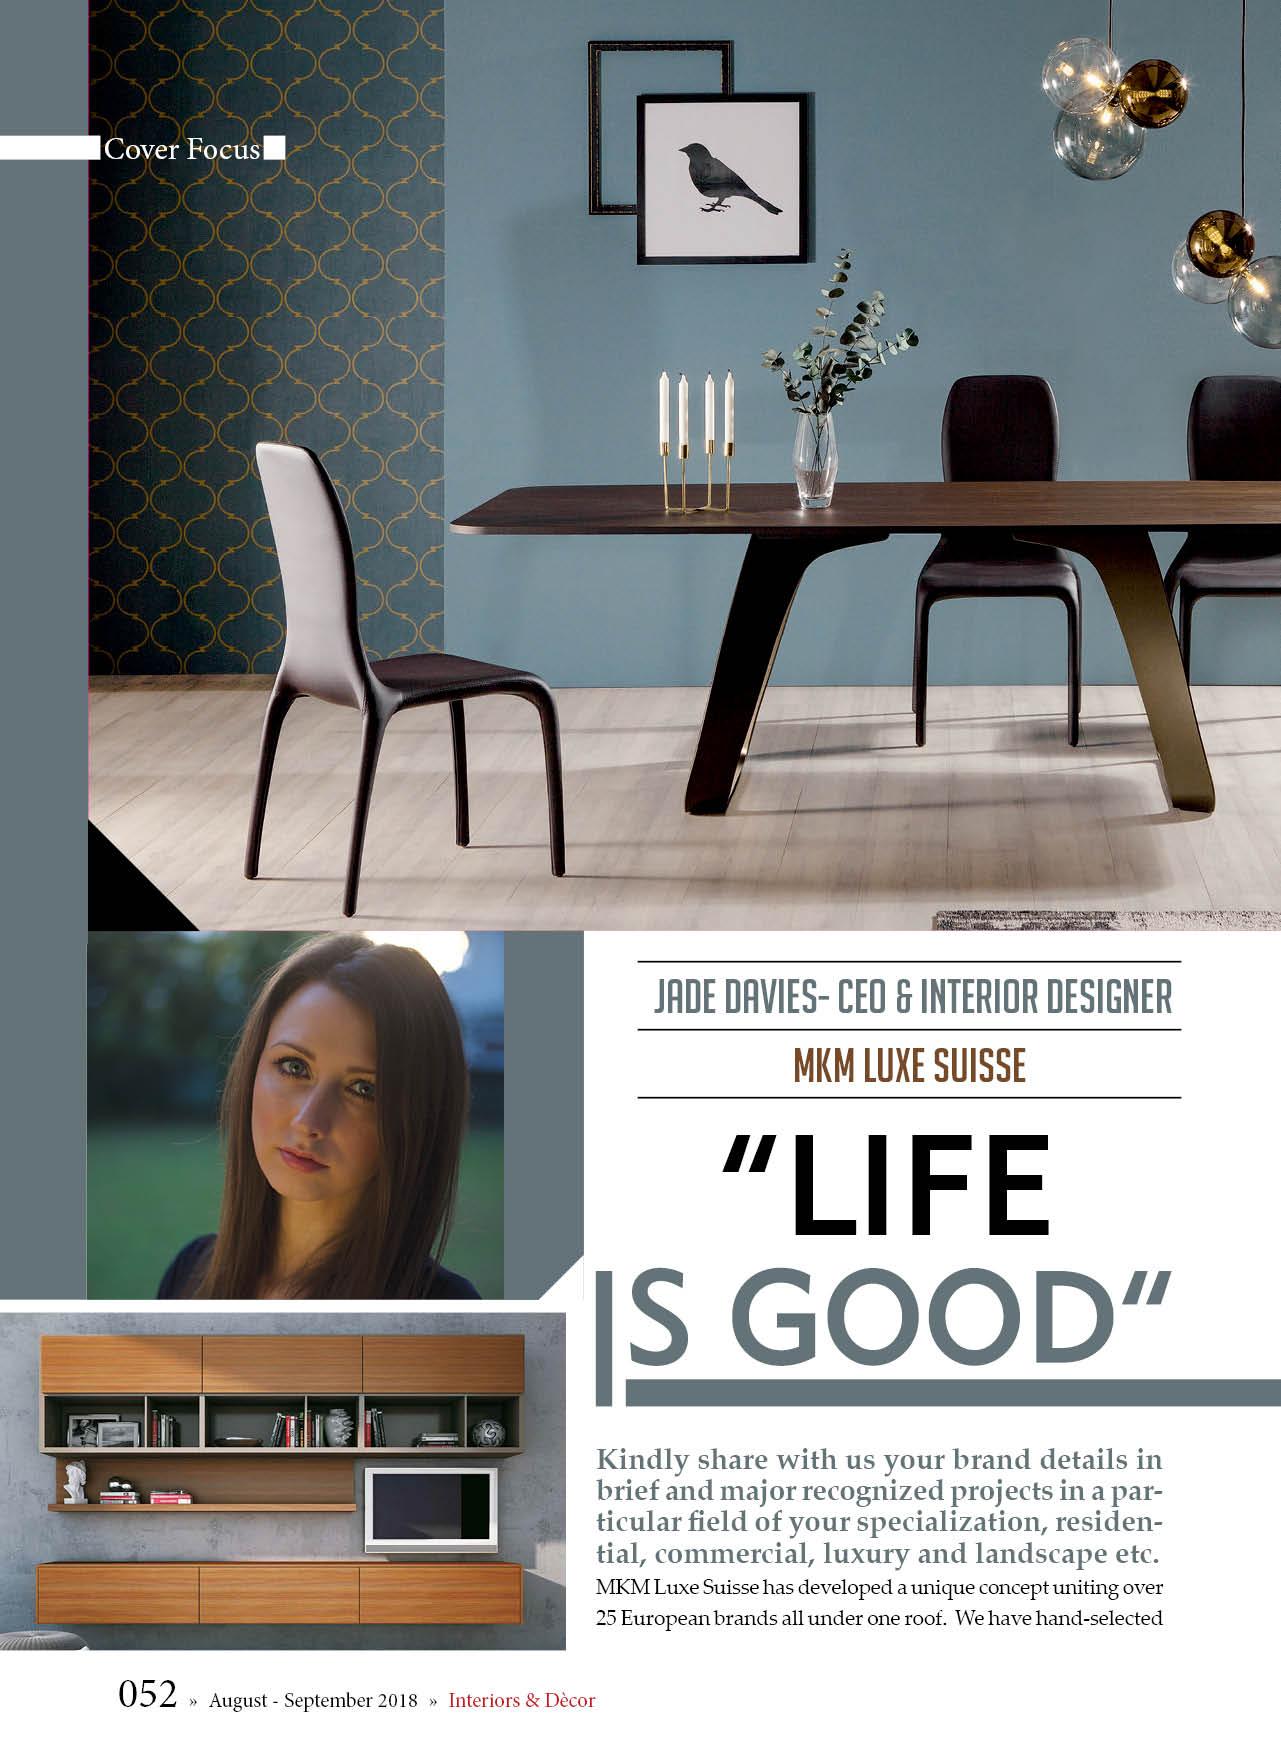 MKM Luxe Suisse - Interiors & Decor Magazine - Brand Media pg1.jpg